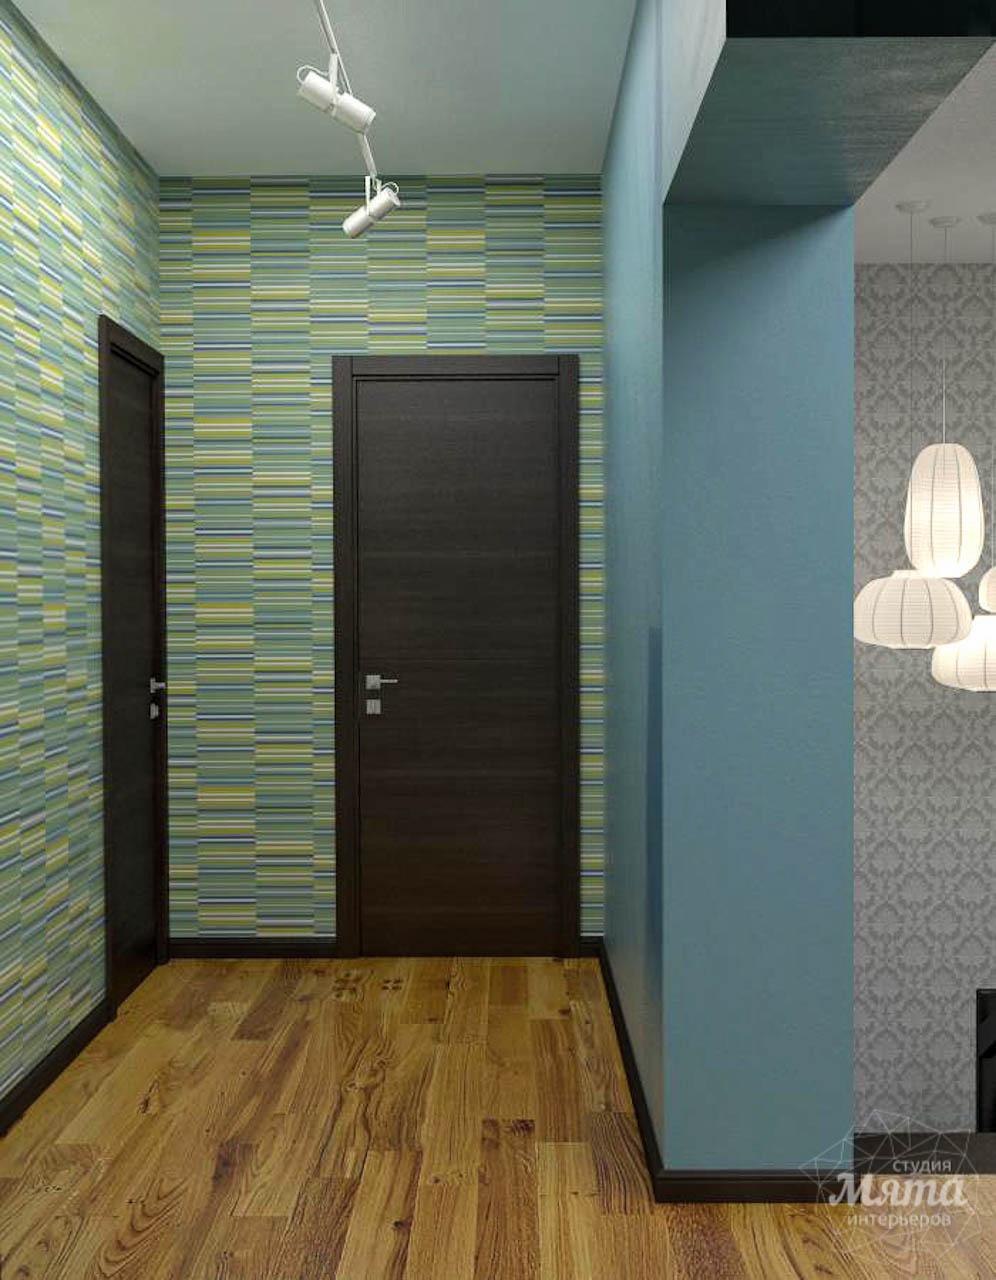 Дизайн проект интерьера коттеджа  в стиле минимализм по ул. Барвинка 15 img1403794910